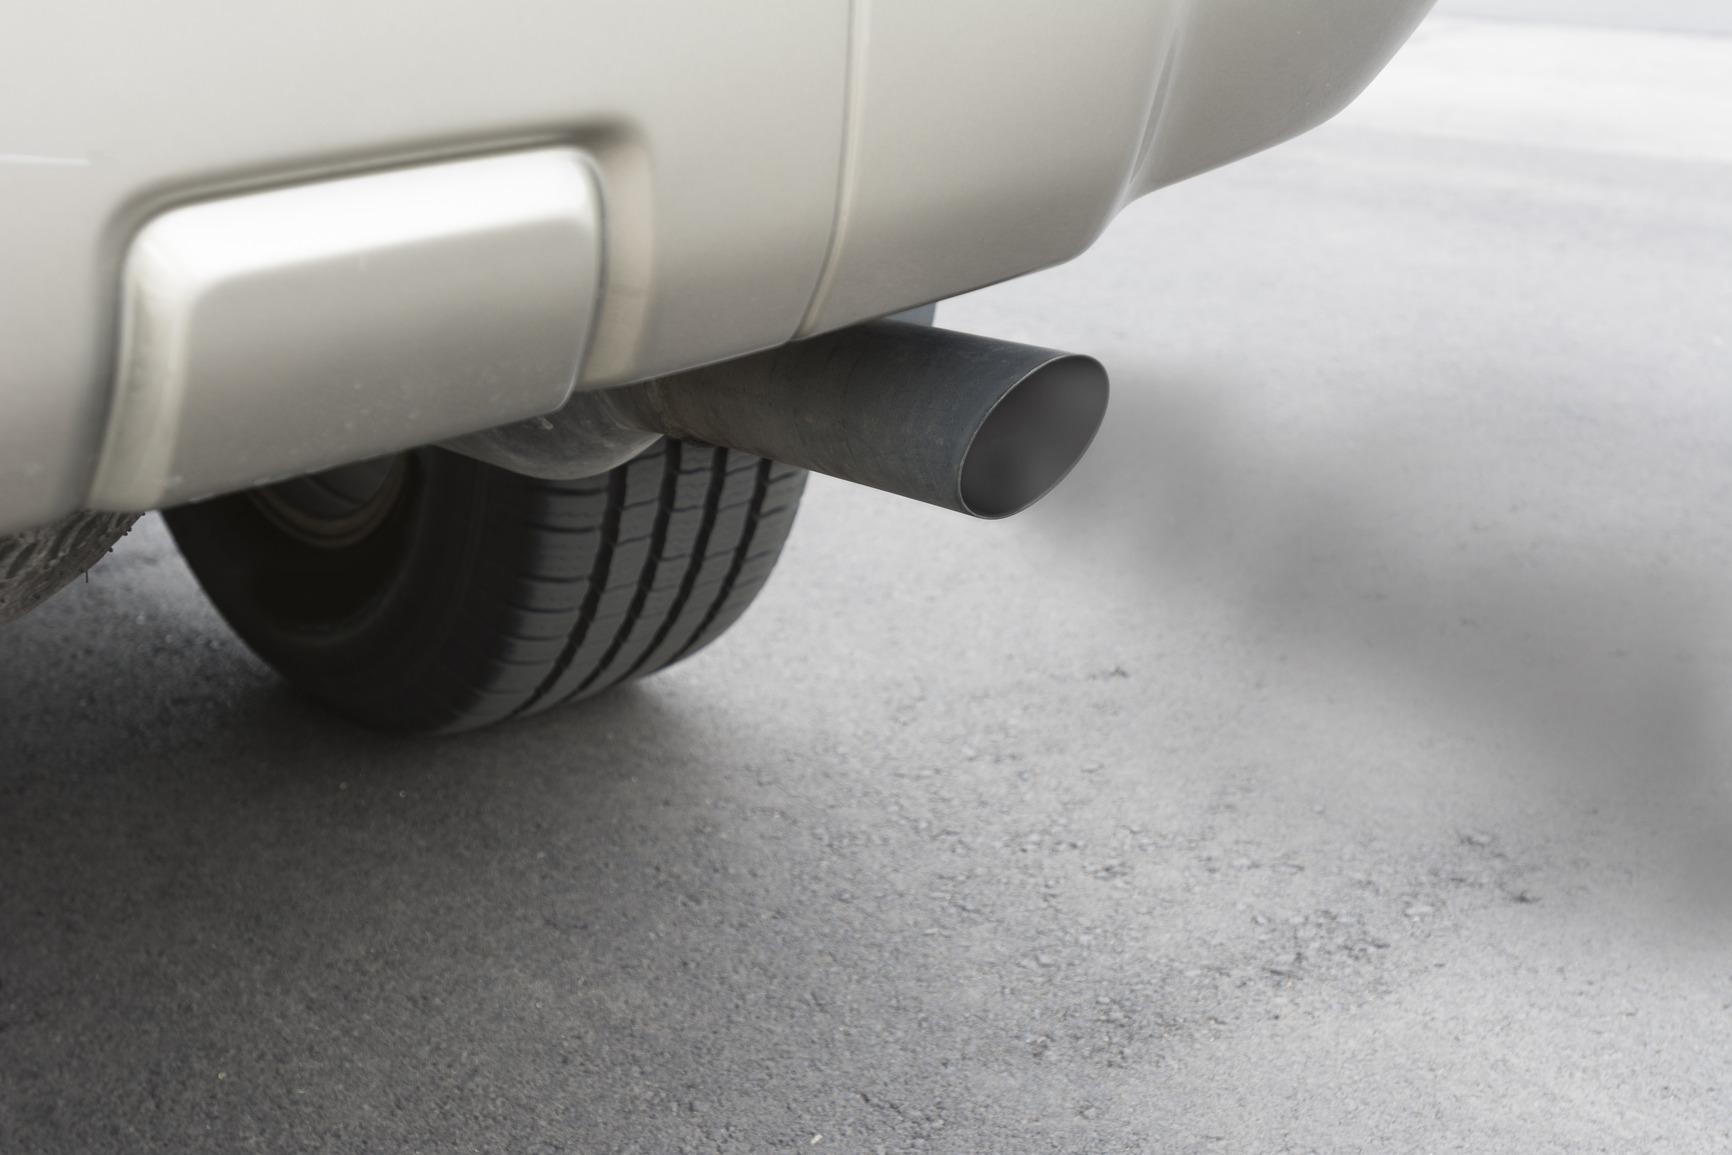 Mazda Emissions Testing near Seattle at Lee Johnson Mazda